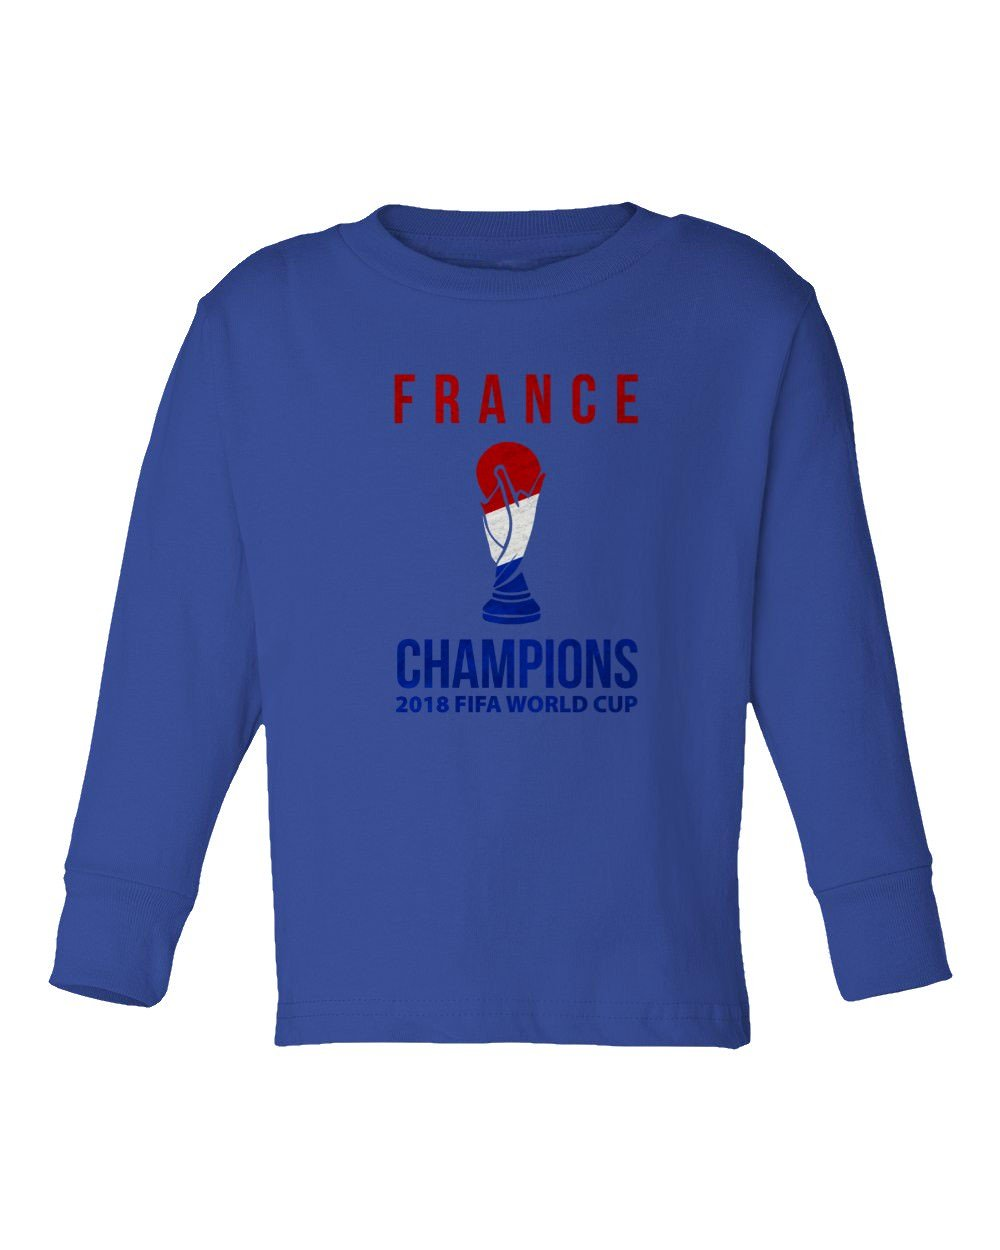 ab1f34d7cd7 Amazon.com: BTA Apparel New Soccer France World Champions Little Kids Girls  Boys Toddler Long Sleeve T-Shirt: Sports & Outdoors